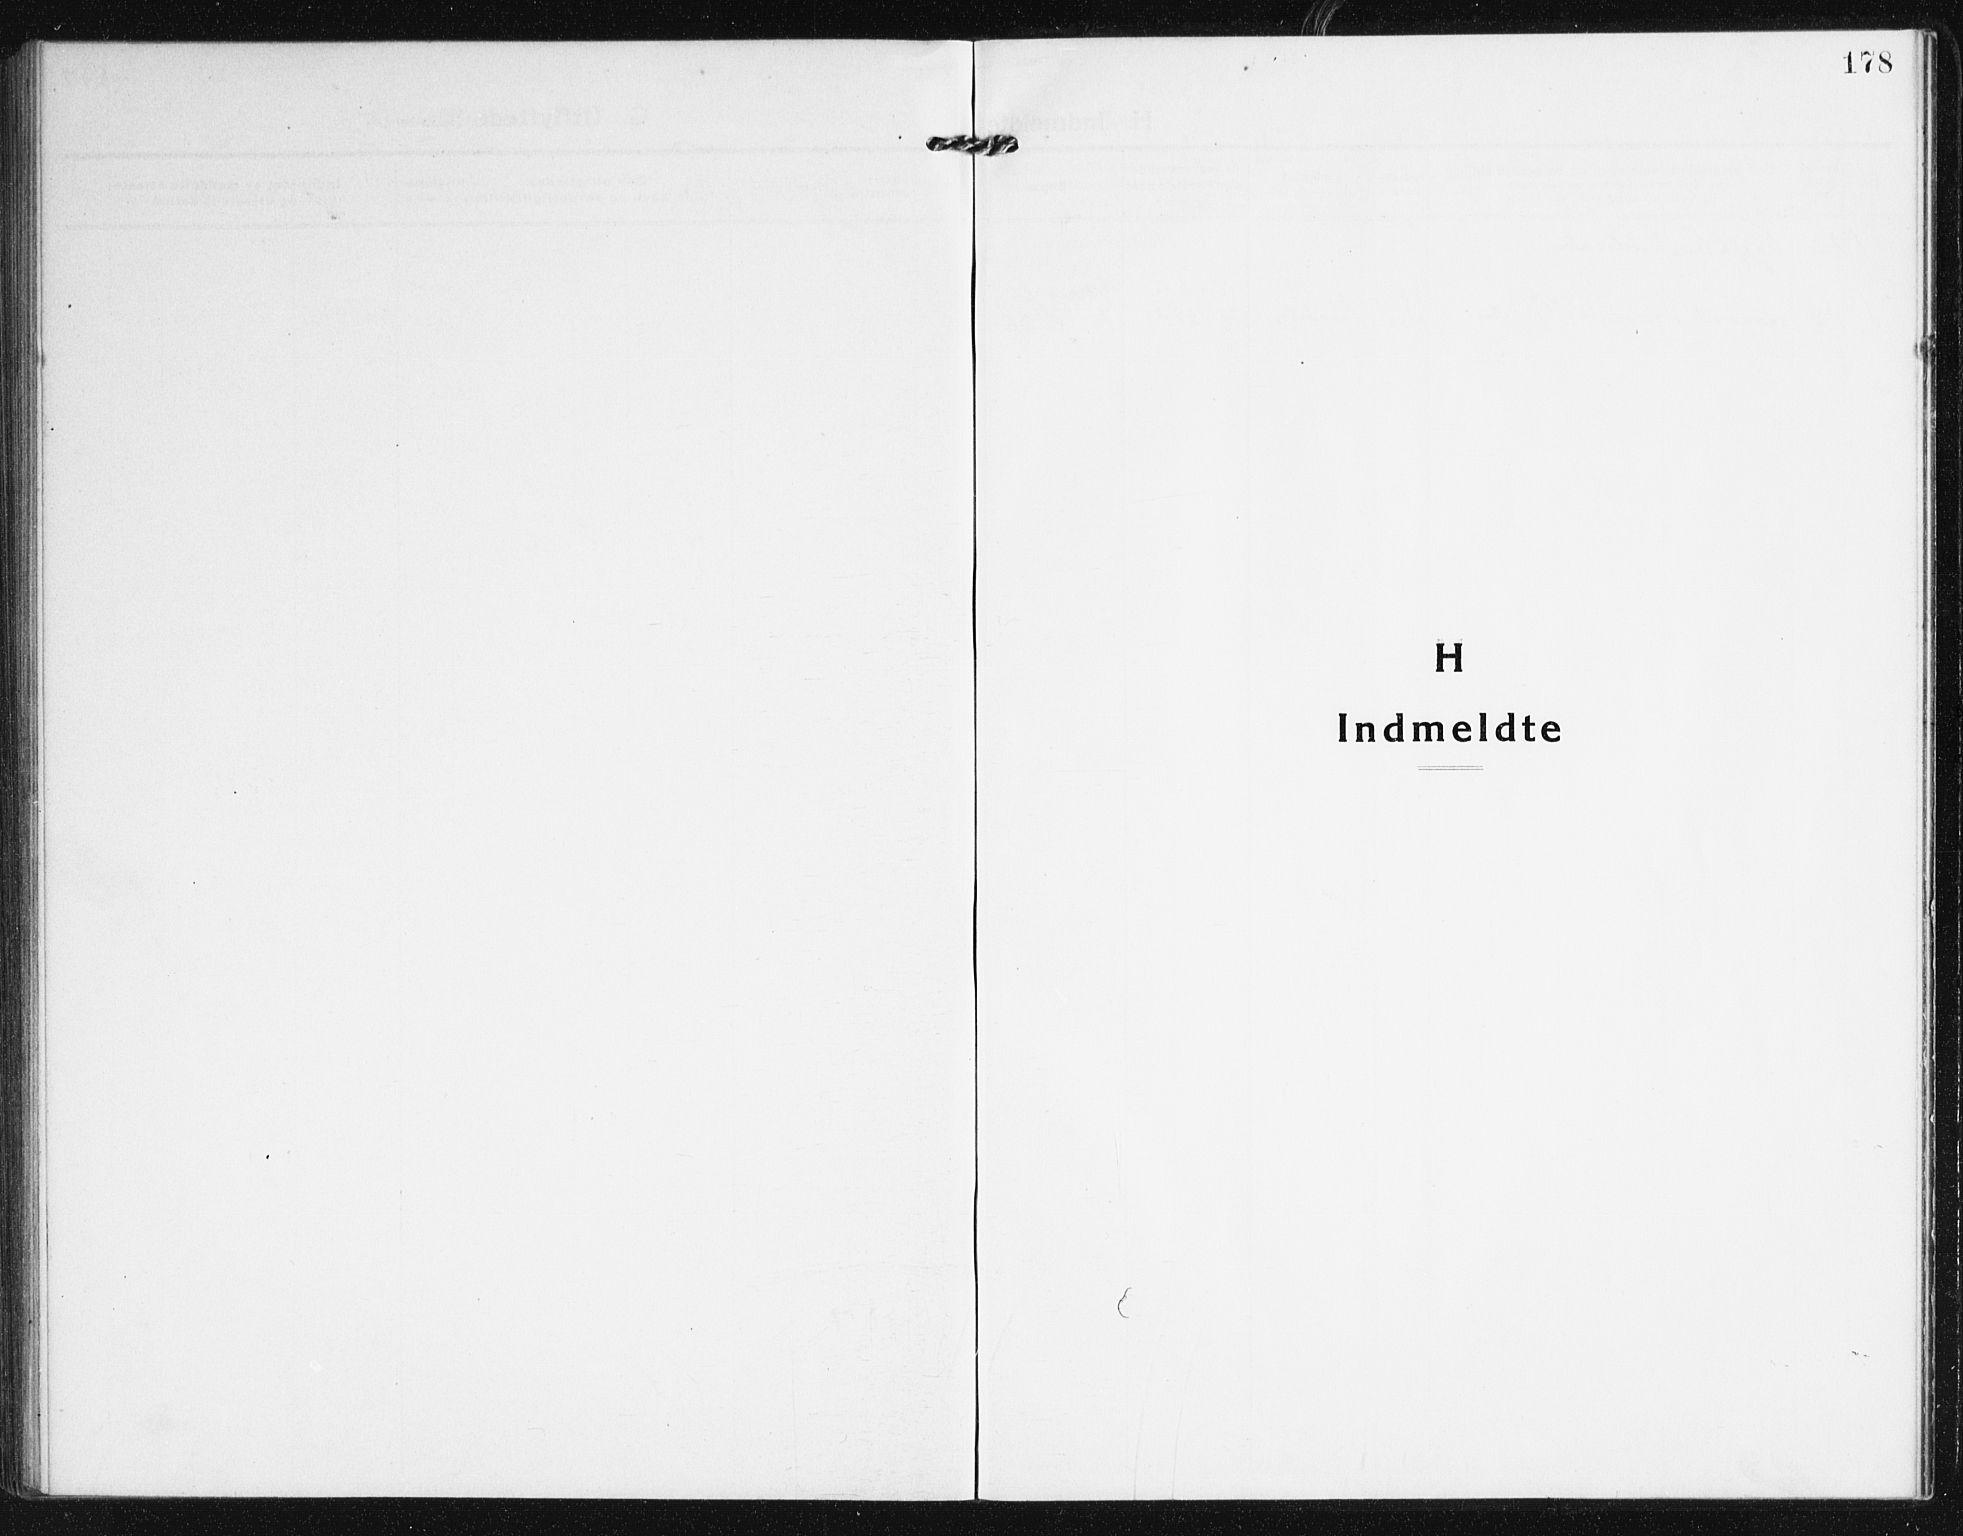 SAK, Valle sokneprestkontor, F/Fb/Fba/L0004: Klokkerbok nr. B 4, 1917-1944, s. 178